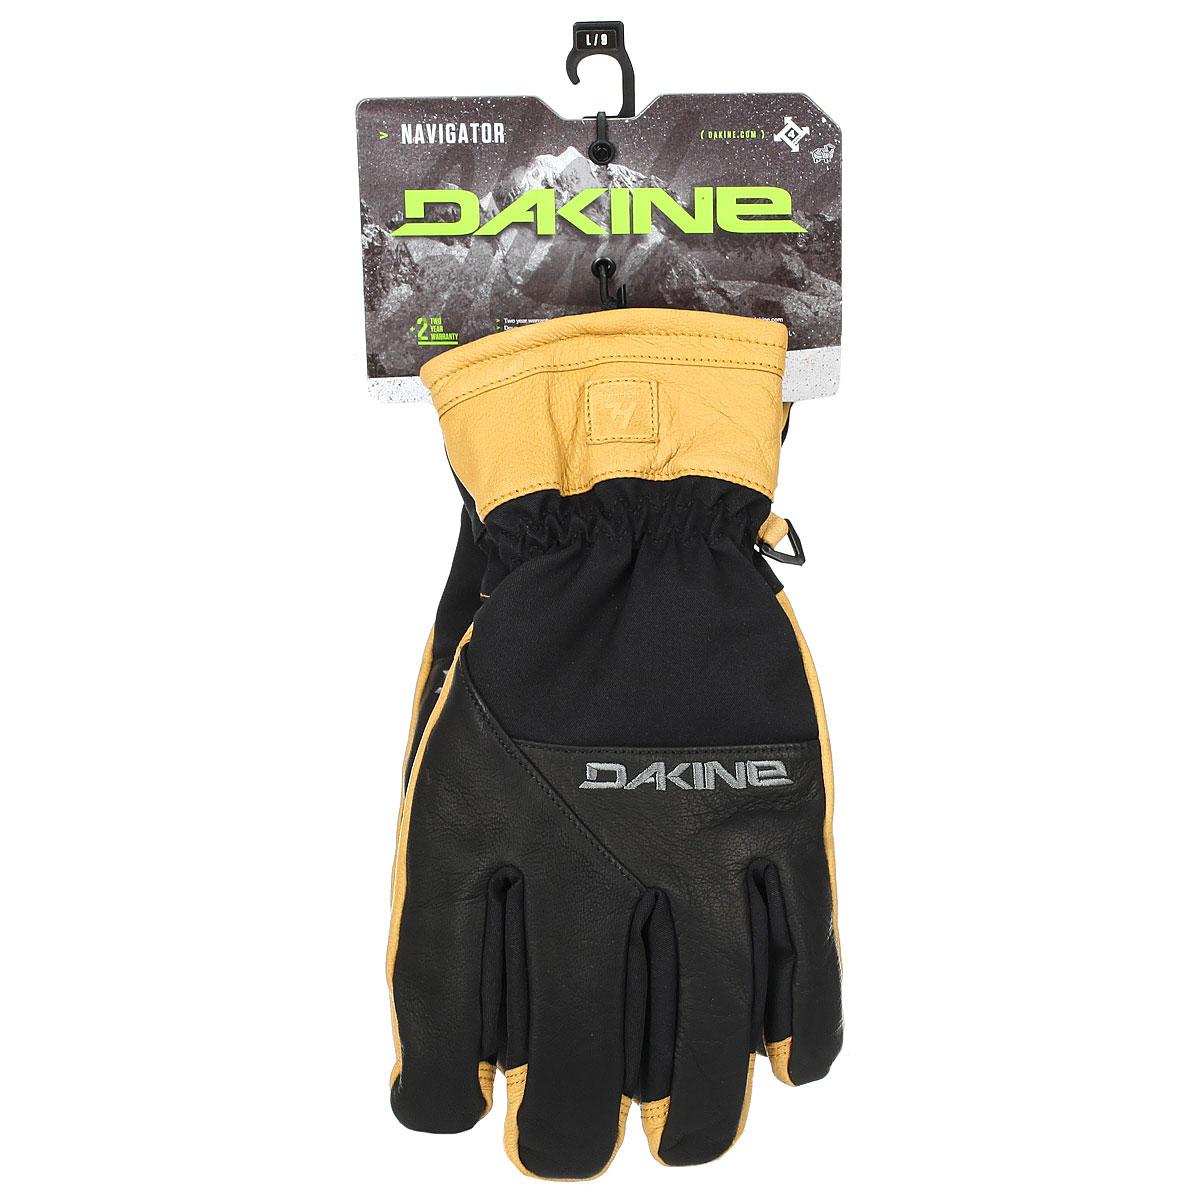 Перчатки сноубордические Dakine Navigator Glove Black/Tan